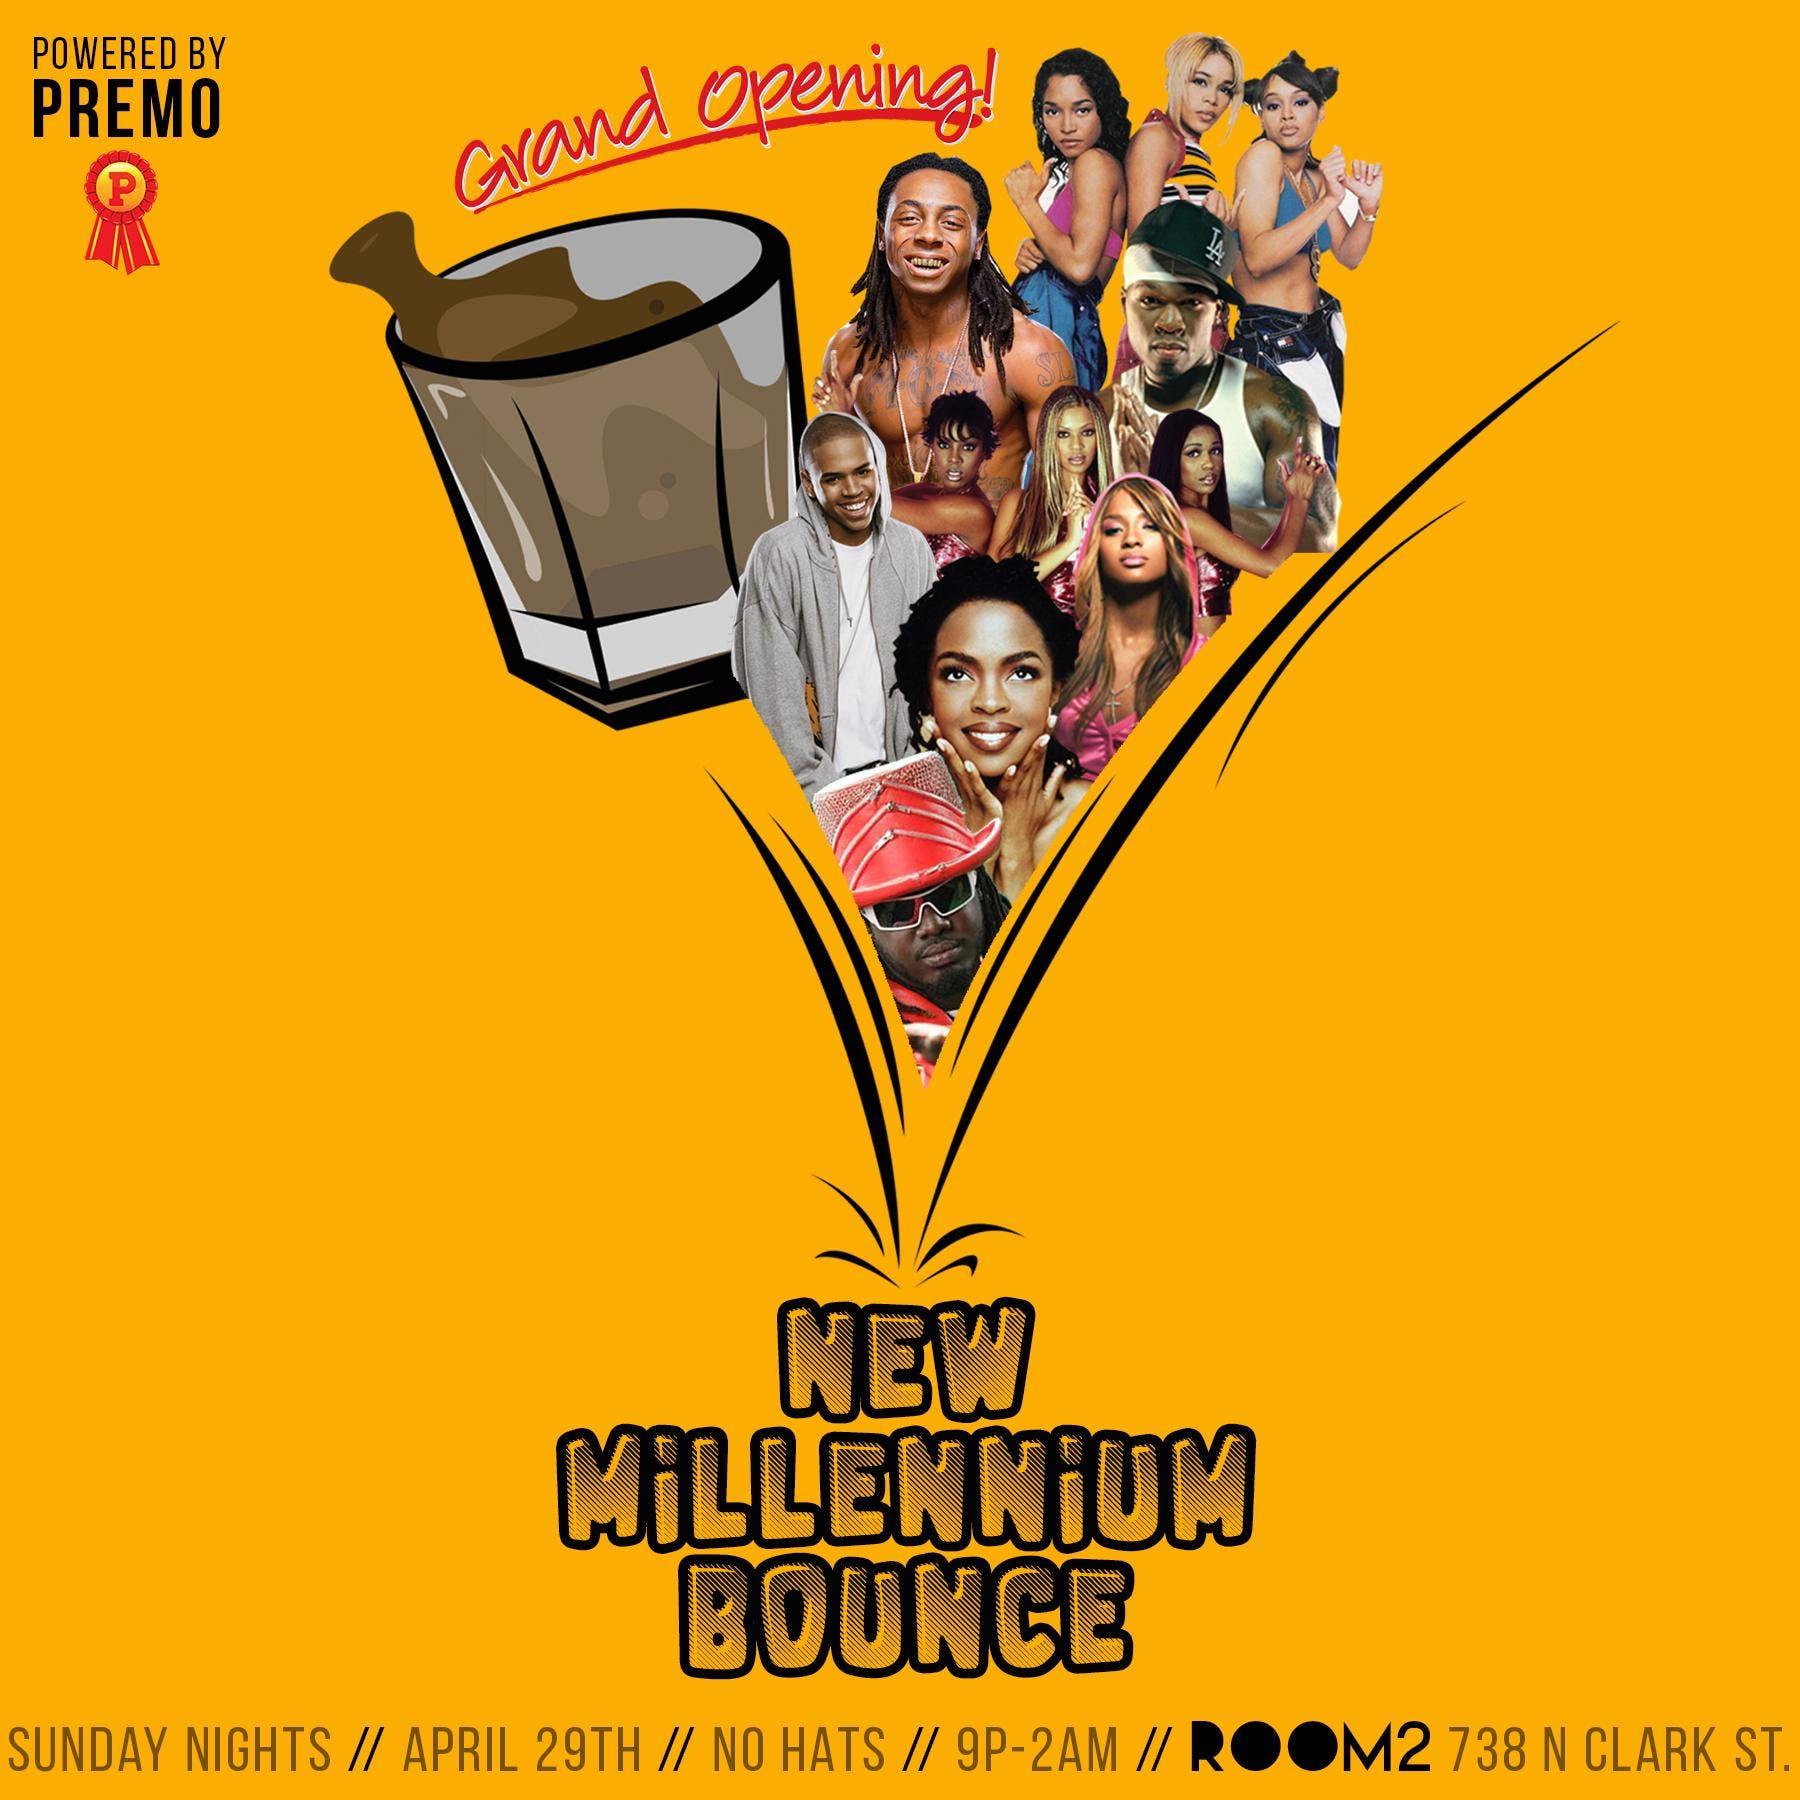 New Millennium Bounce